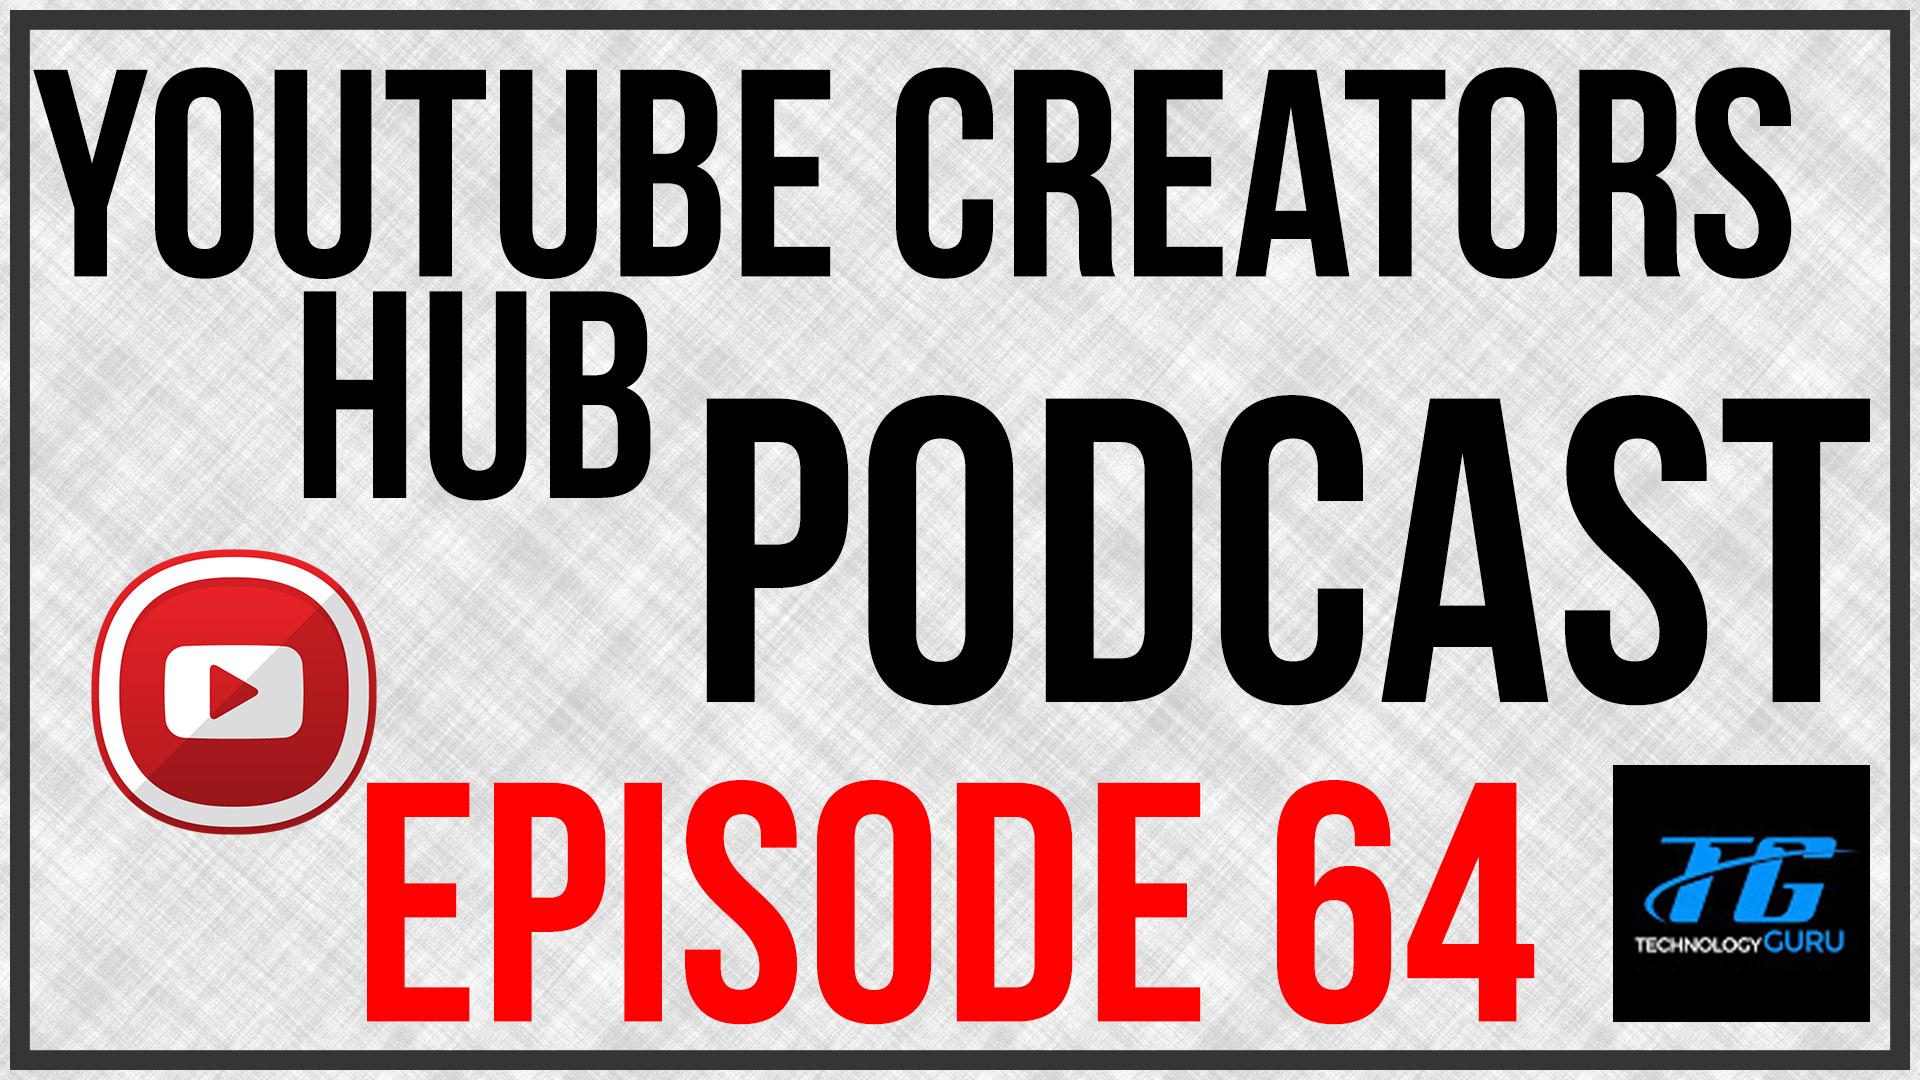 YouTube Creators Hub Podcast Episode 64